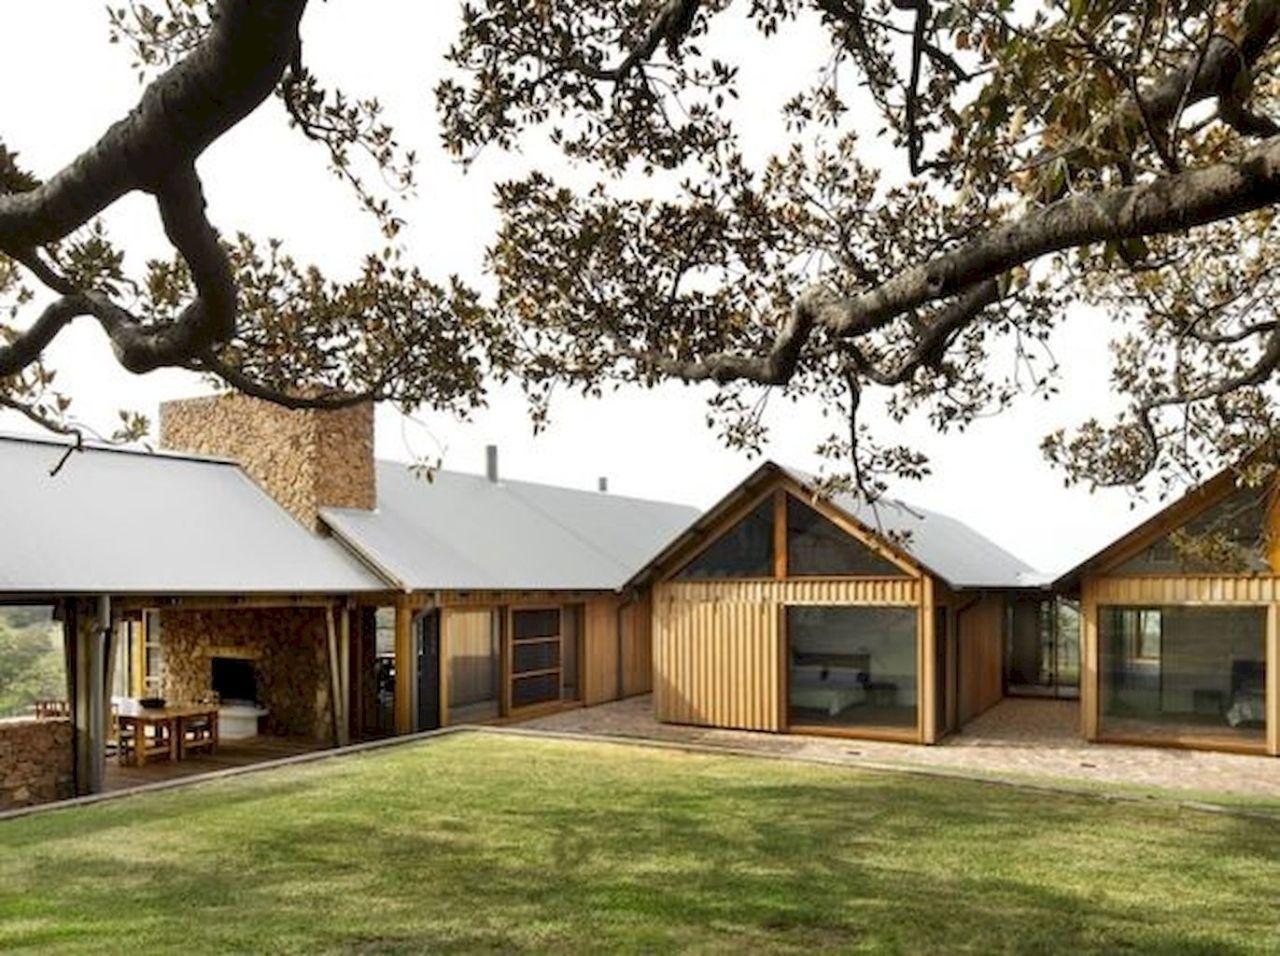 50+ BEST AUSTRALIAN FARMHOUSE STYLE DESIGN IDEAS AND